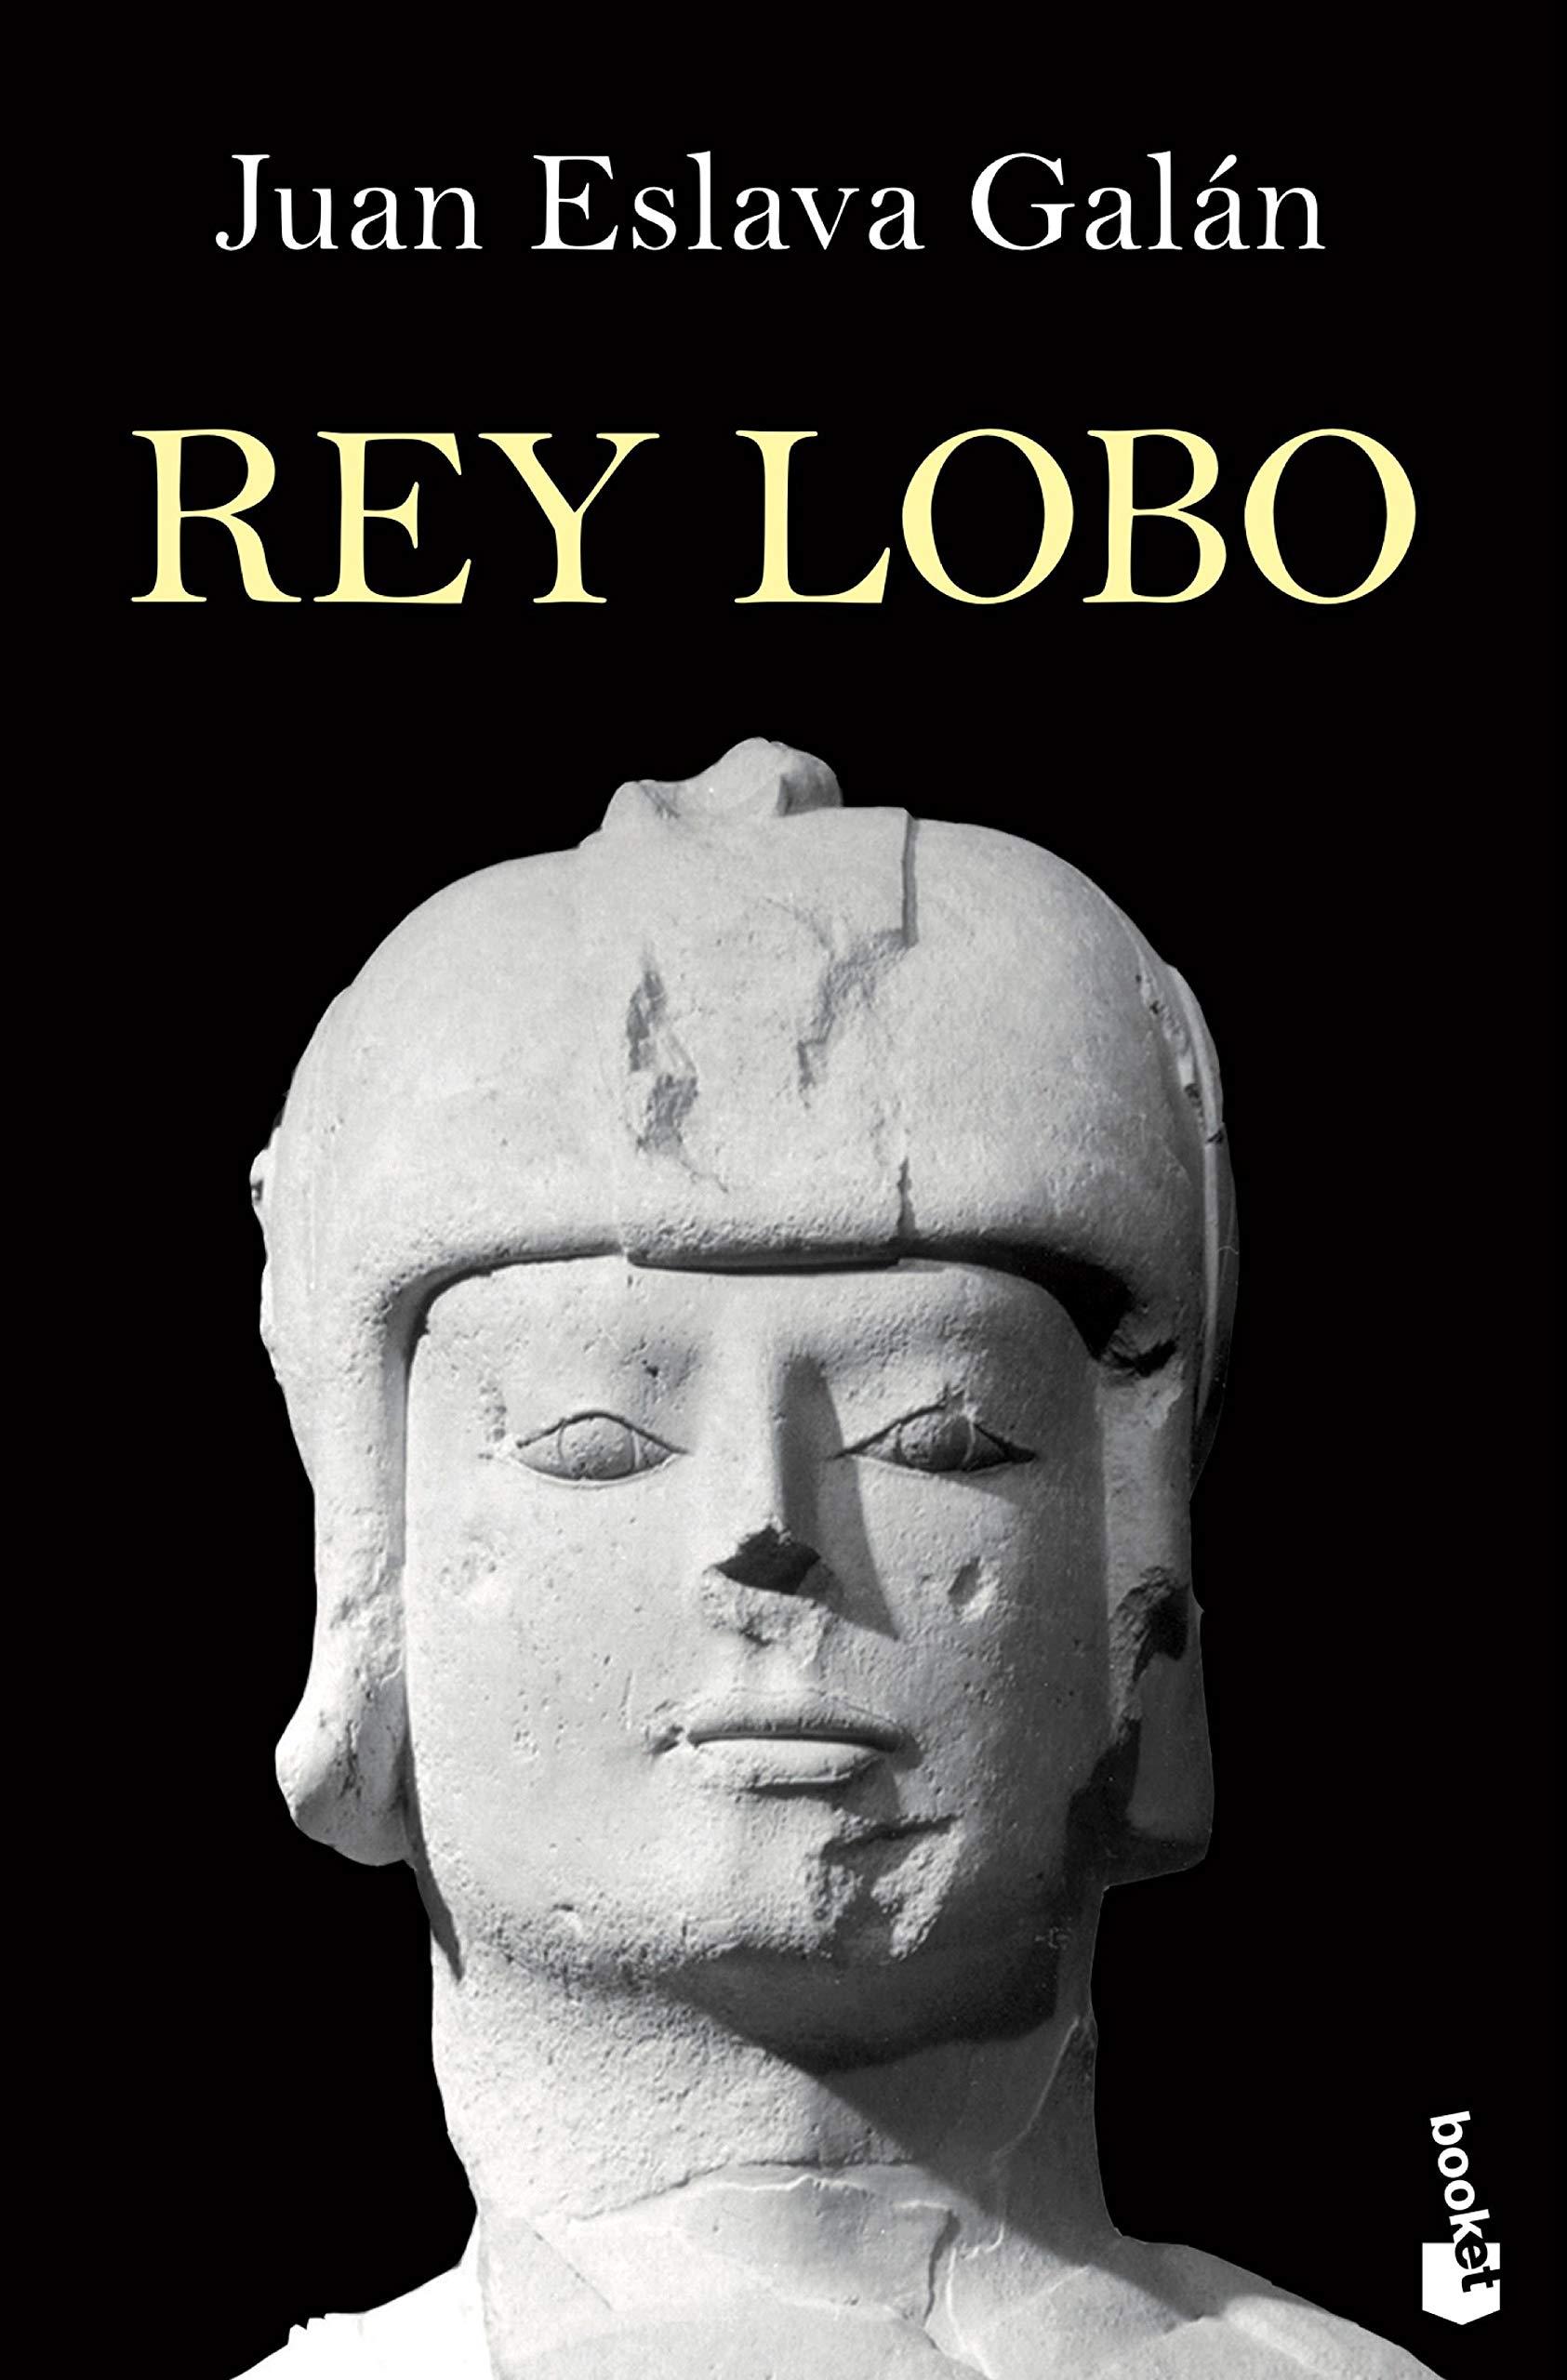 Rey lobo (Novela histórica): Amazon.es: Eslava Galan, Juan: Libros